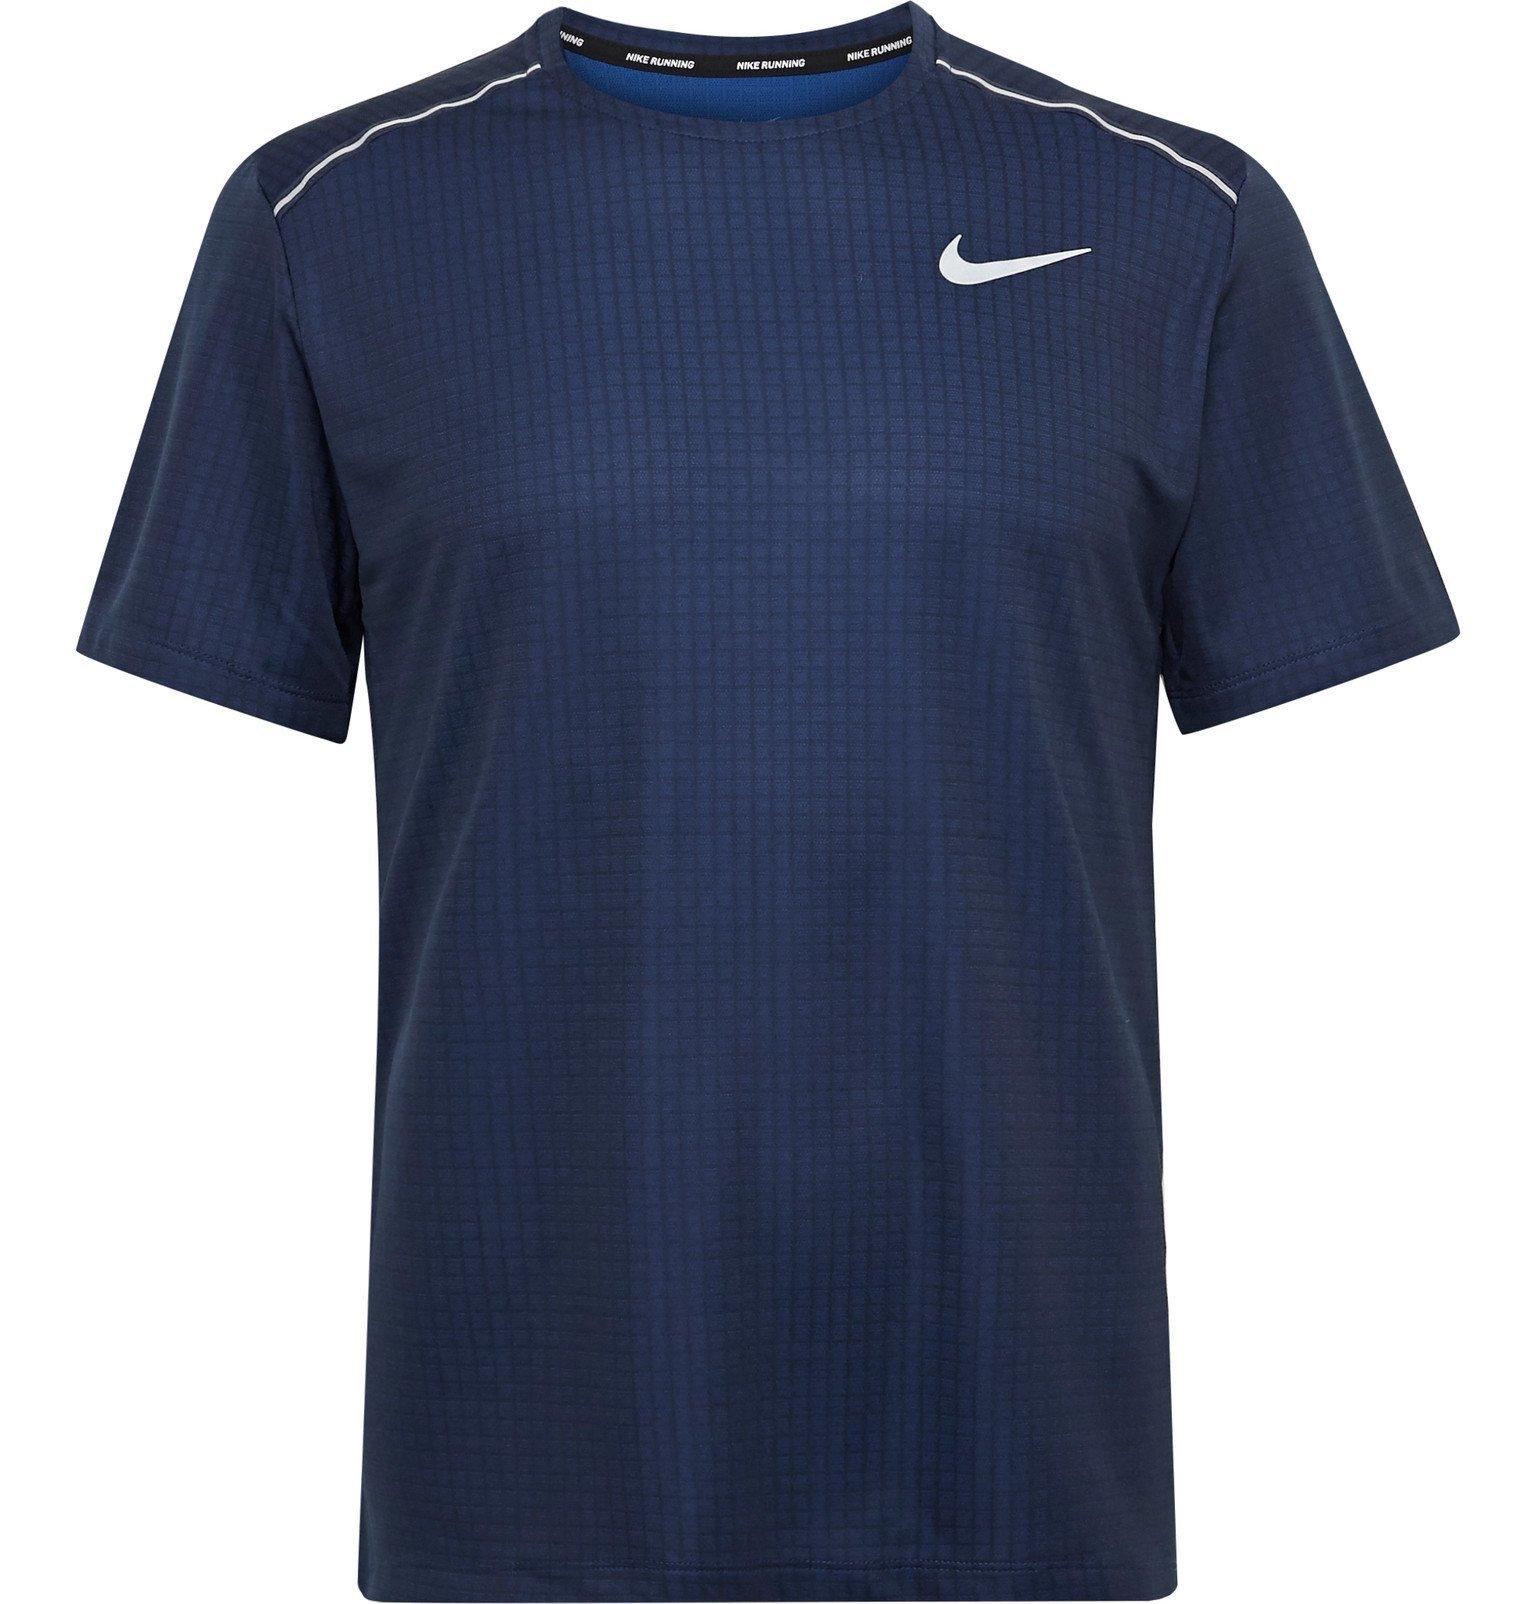 Nike Running - Miler Dri-FIT Ripstop T-Shirt - Blue